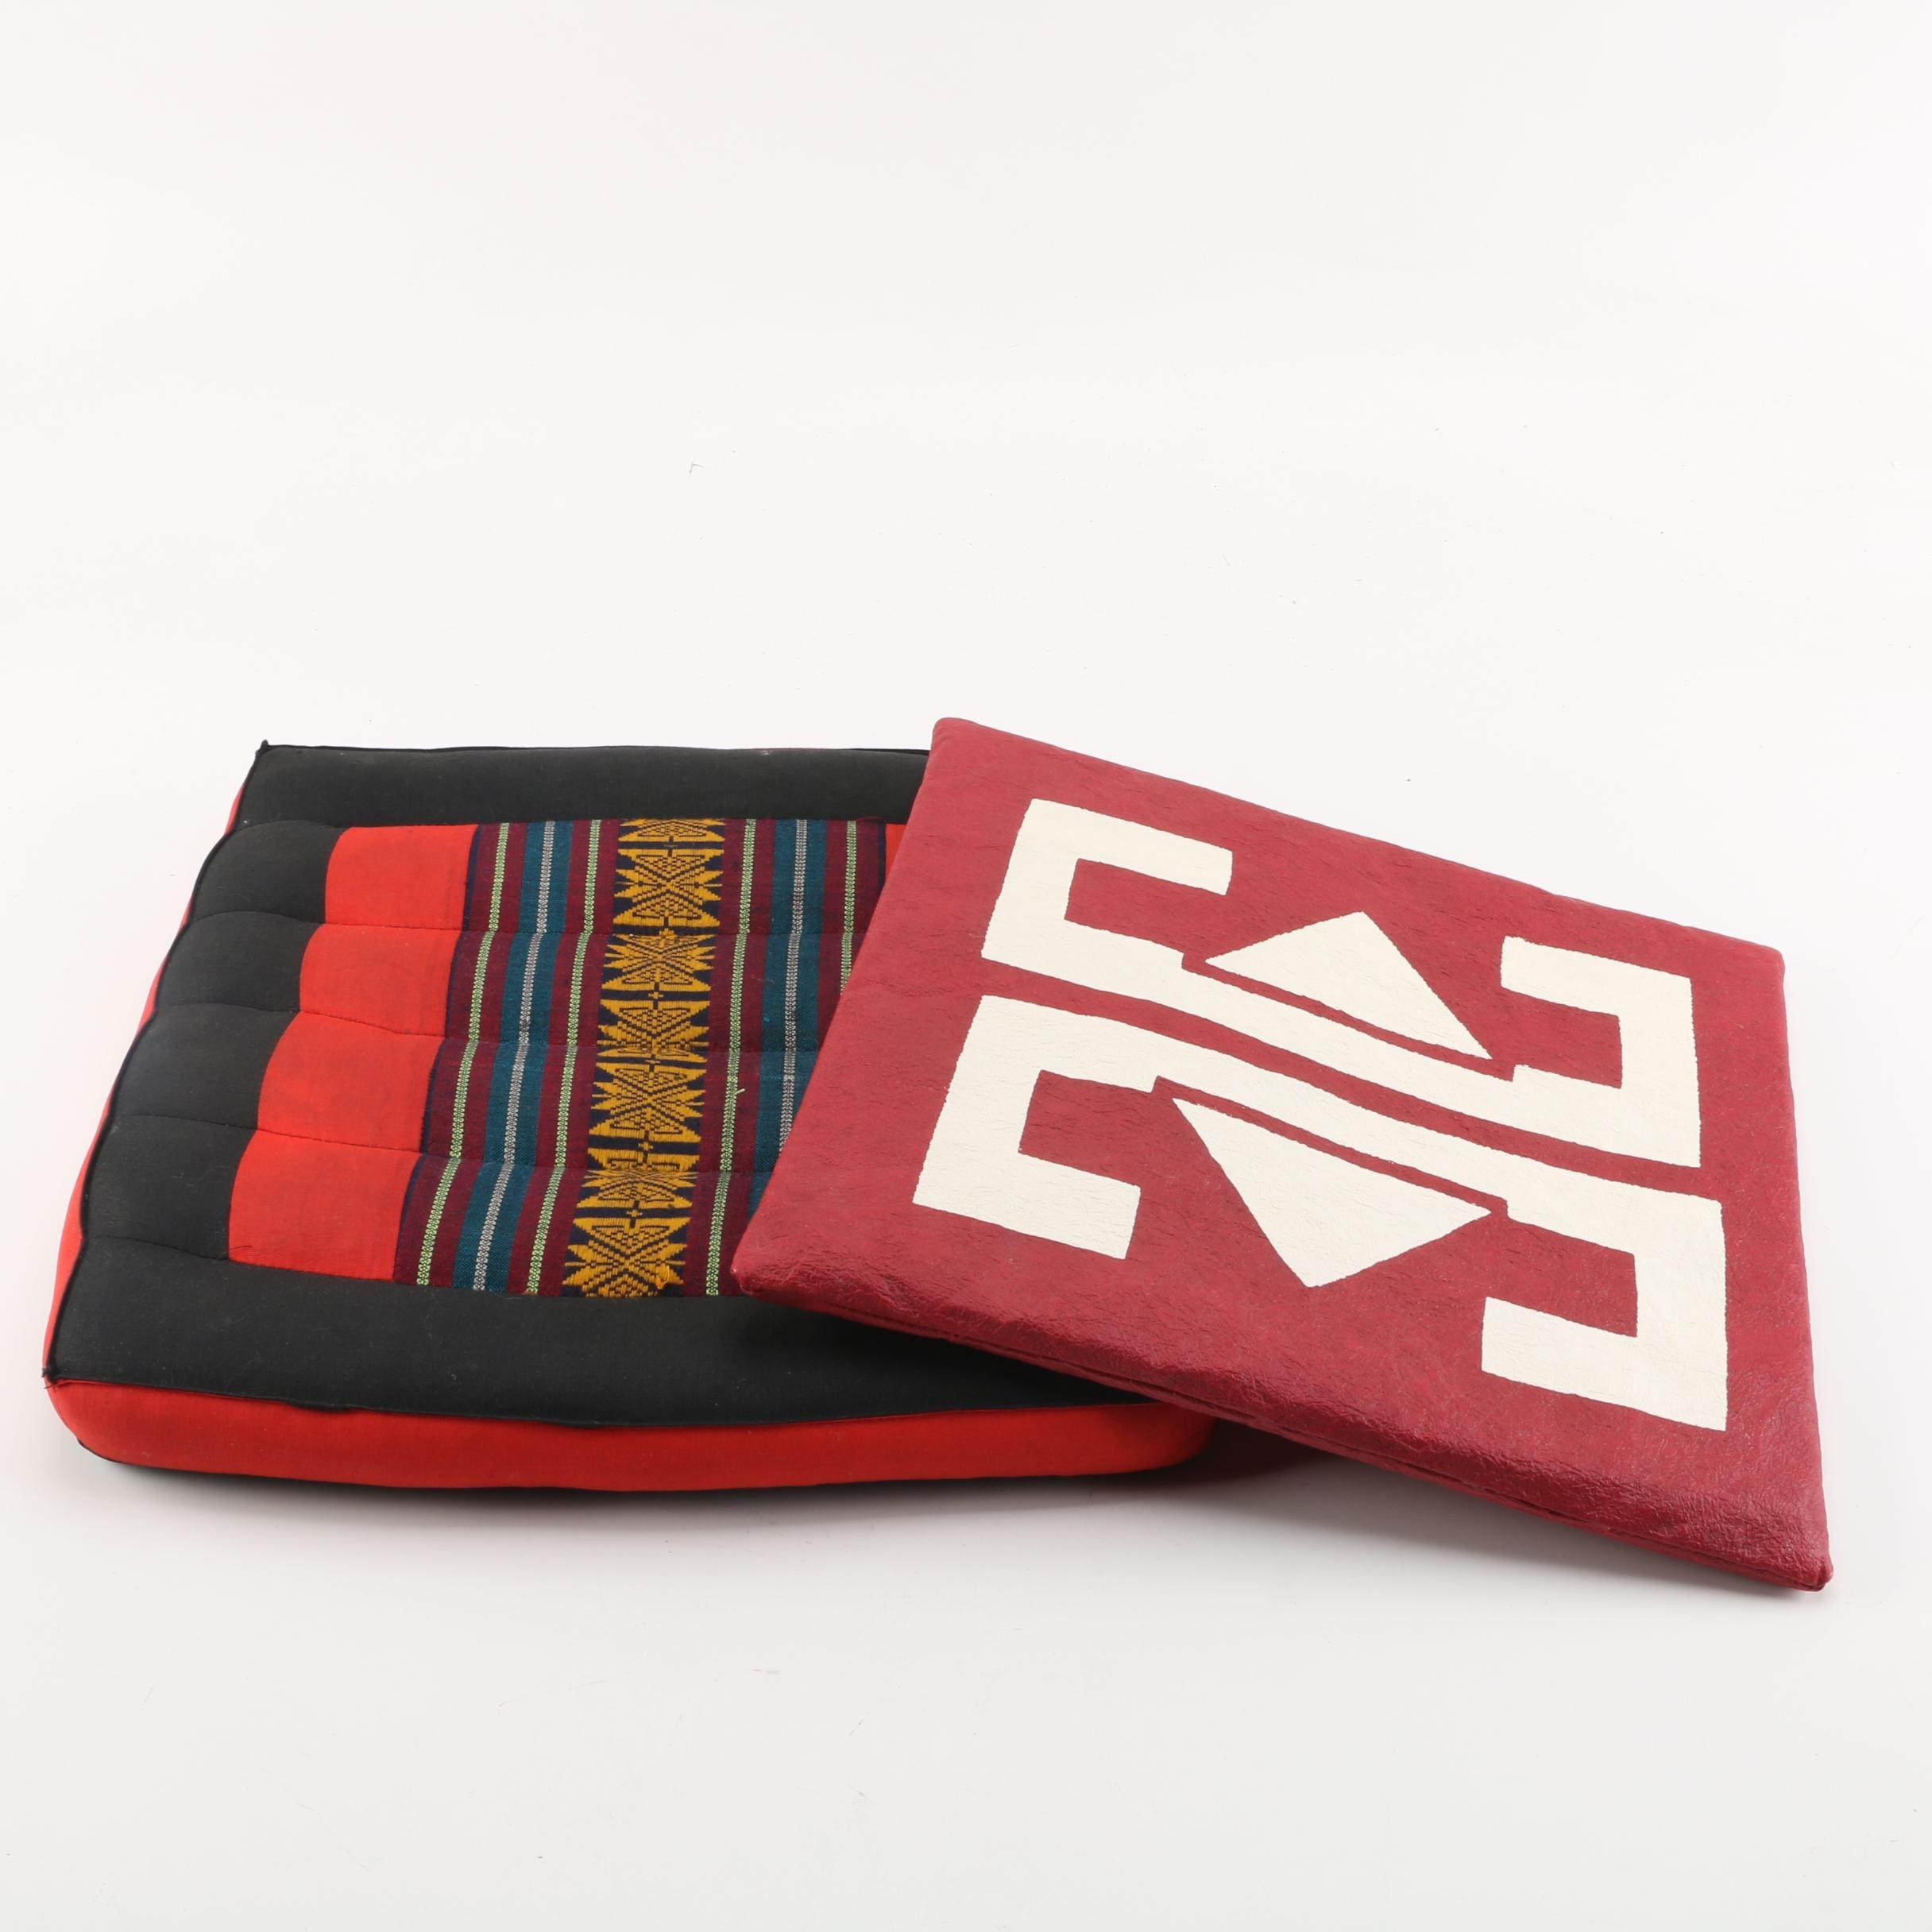 Zabuton-Style Floor Cushions